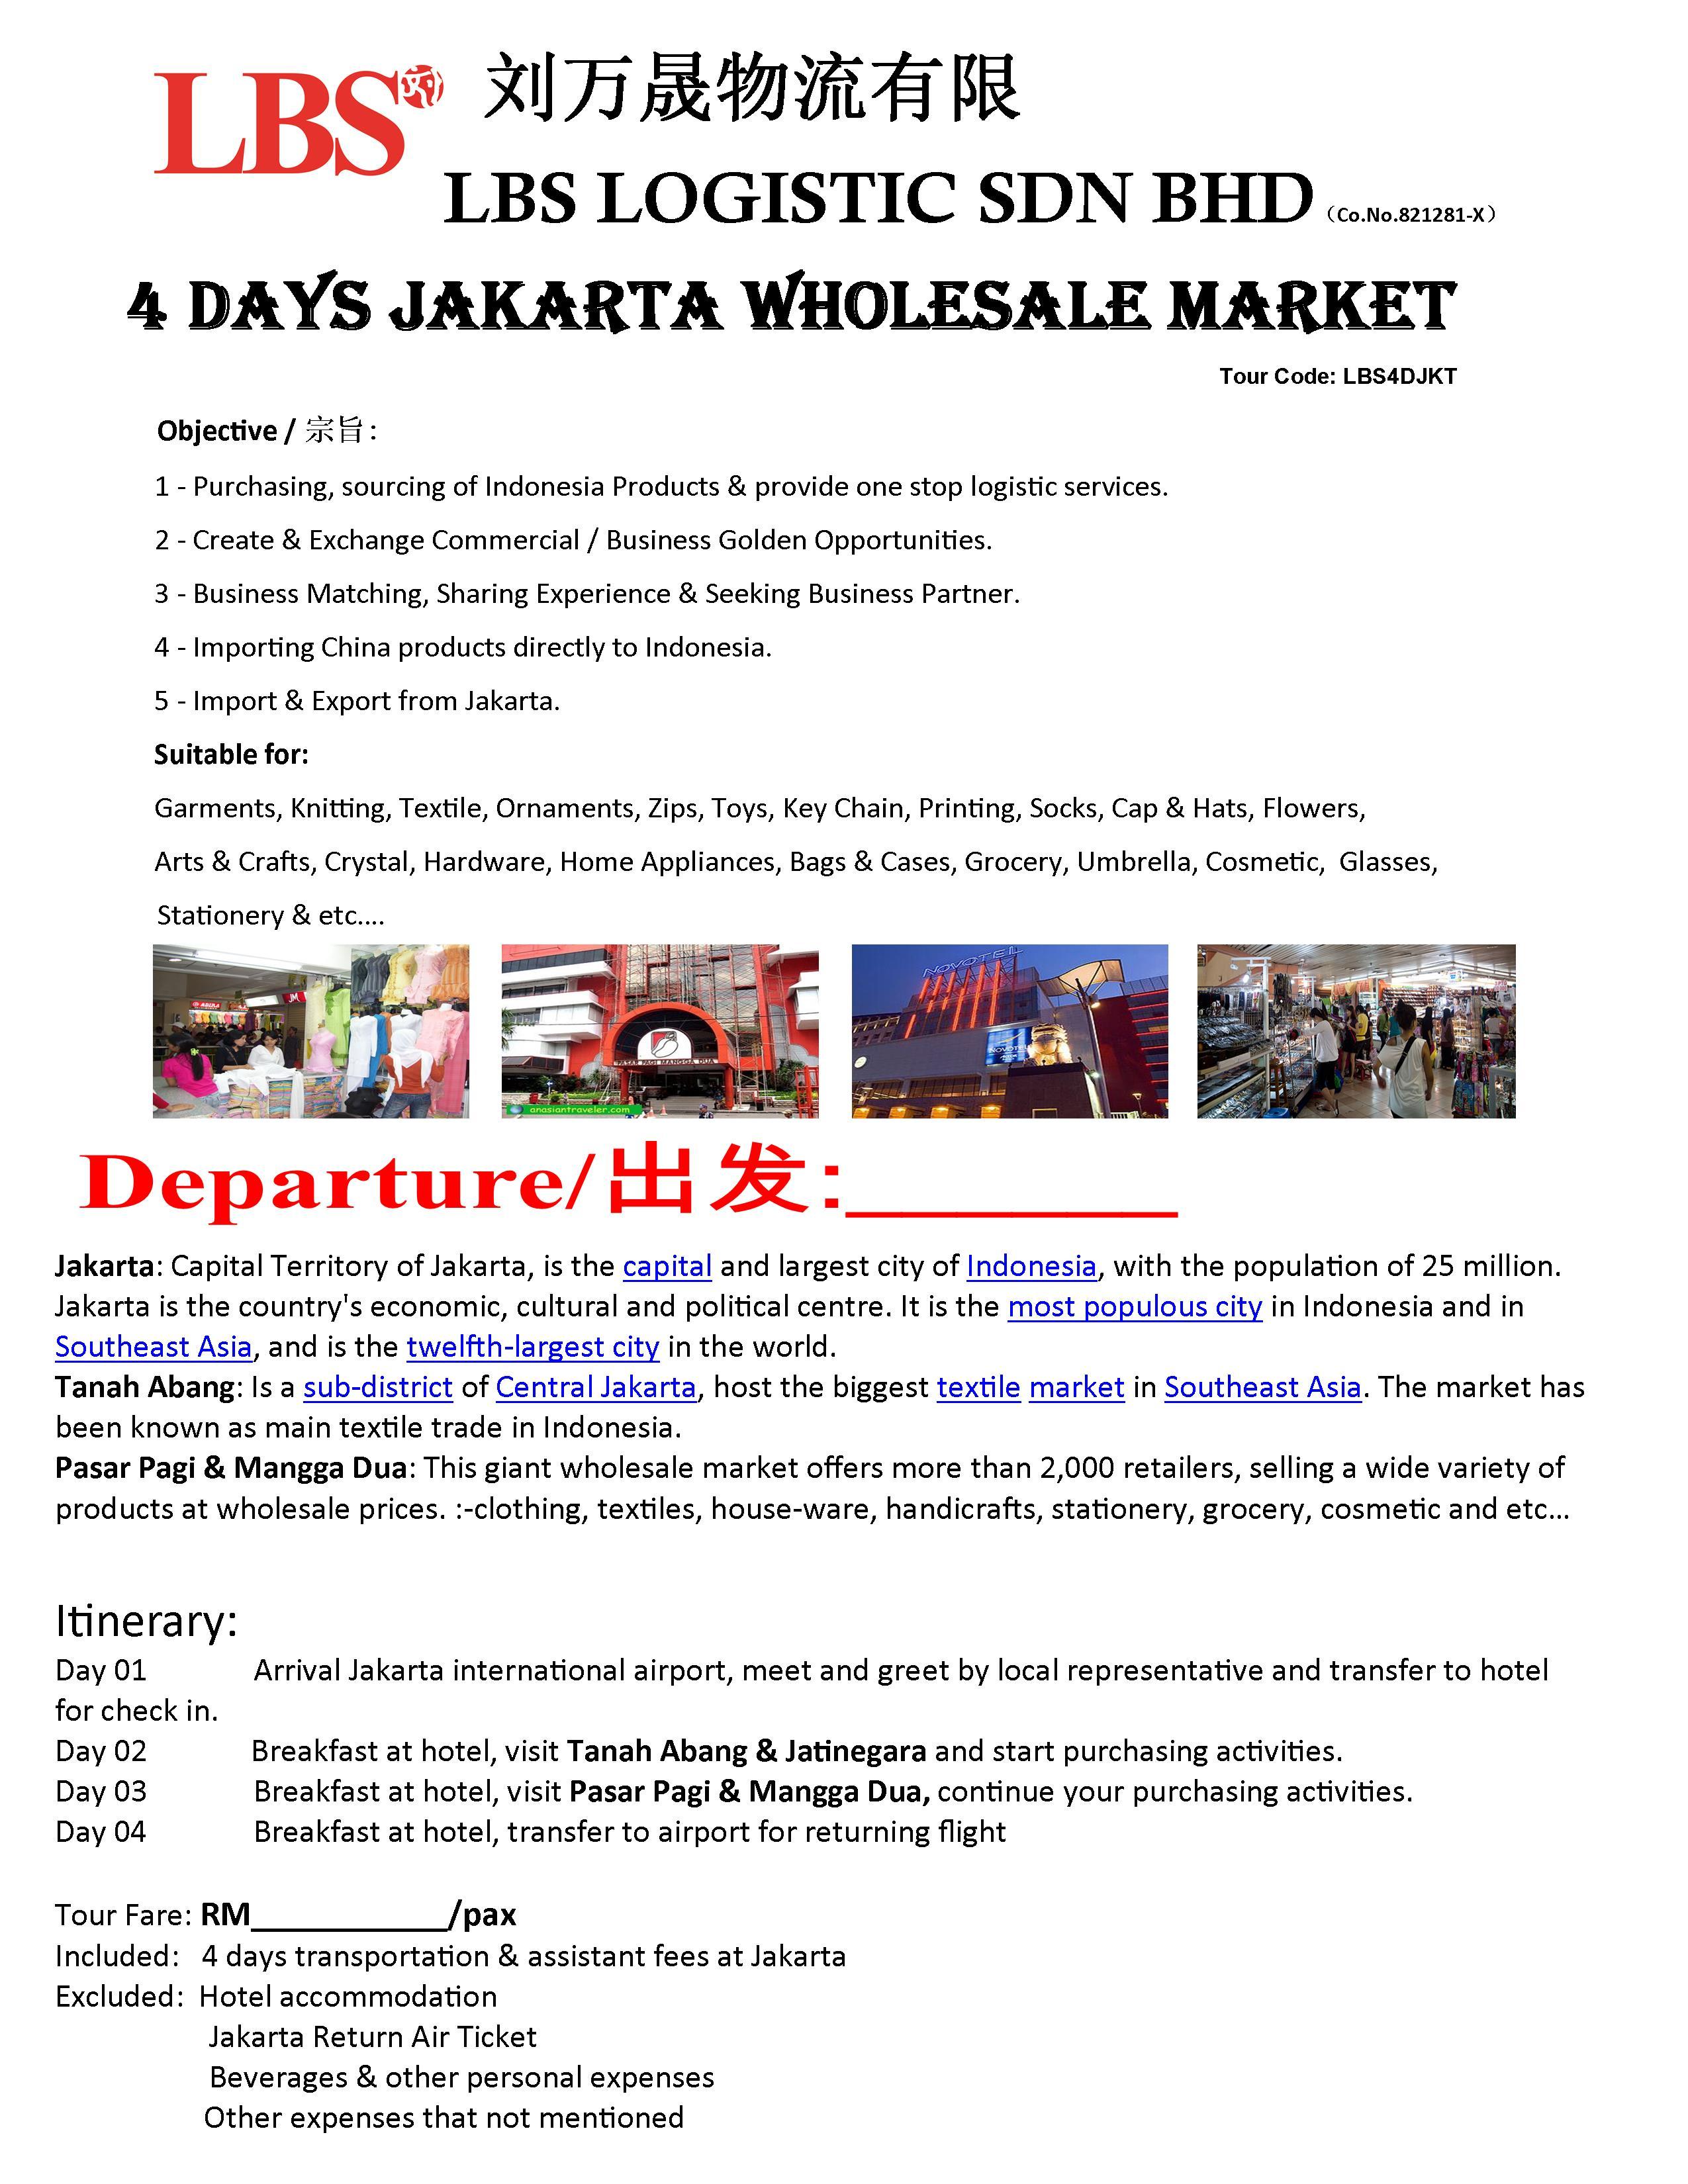 4D Jakarta